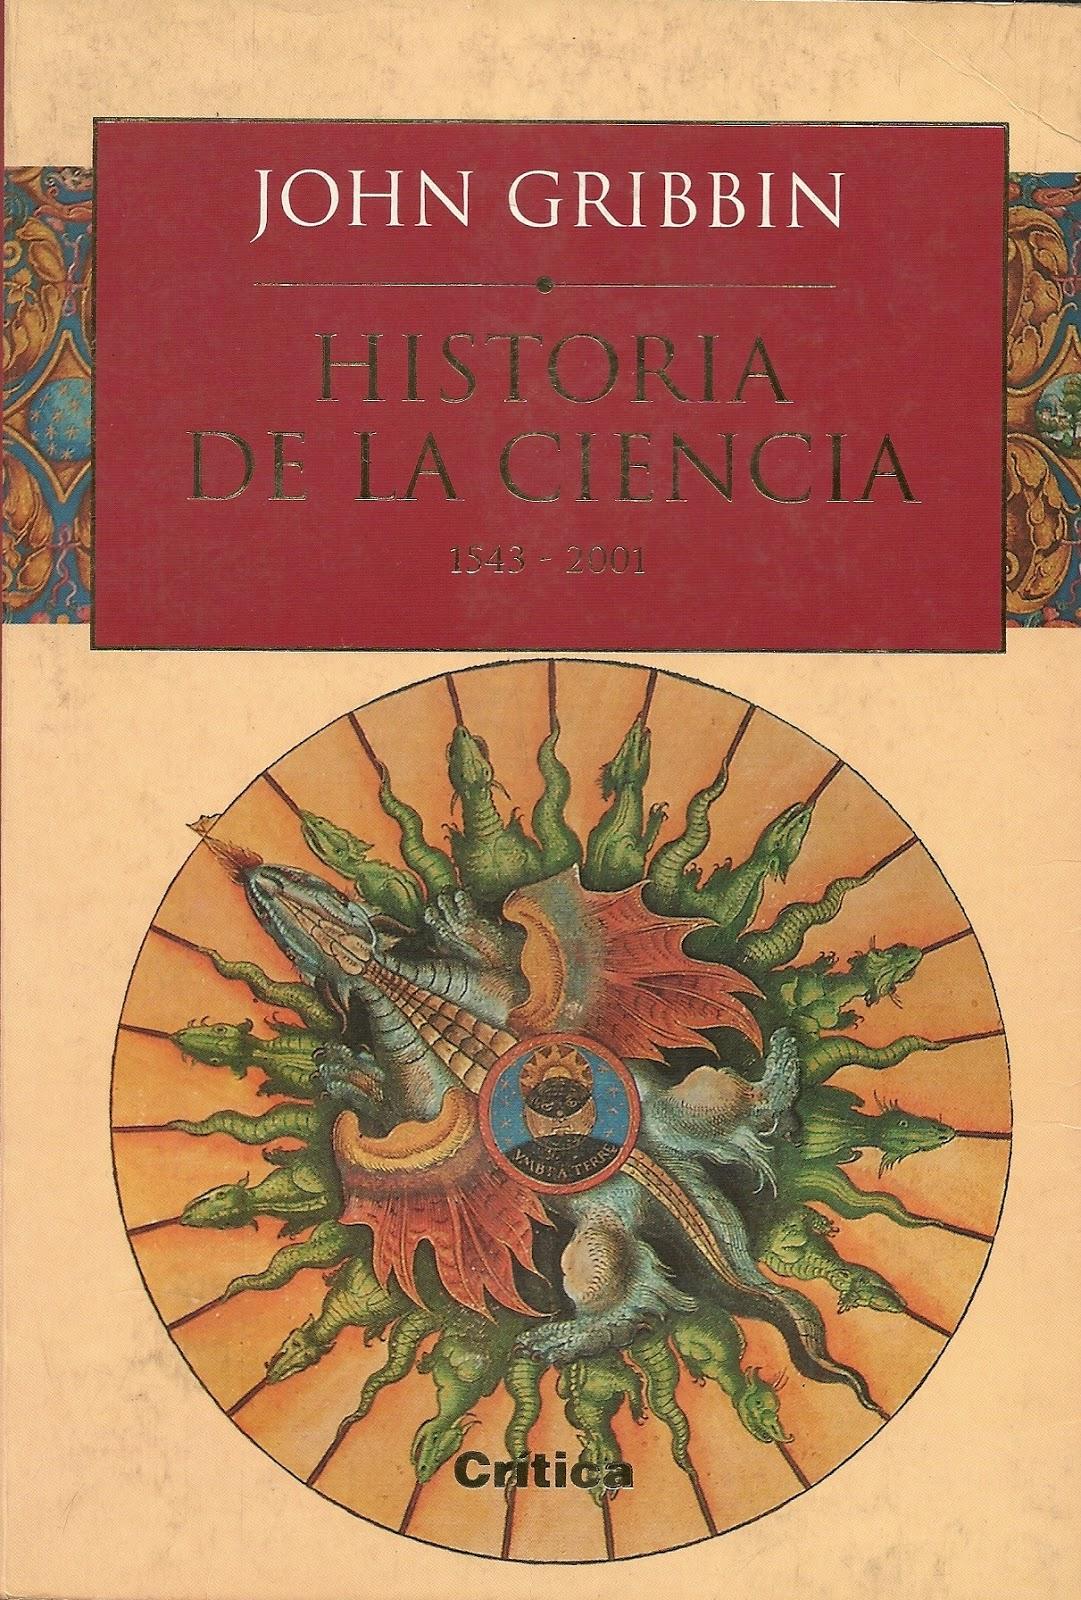 Historia de la Ciencia 1543-2001 – John Gribbin